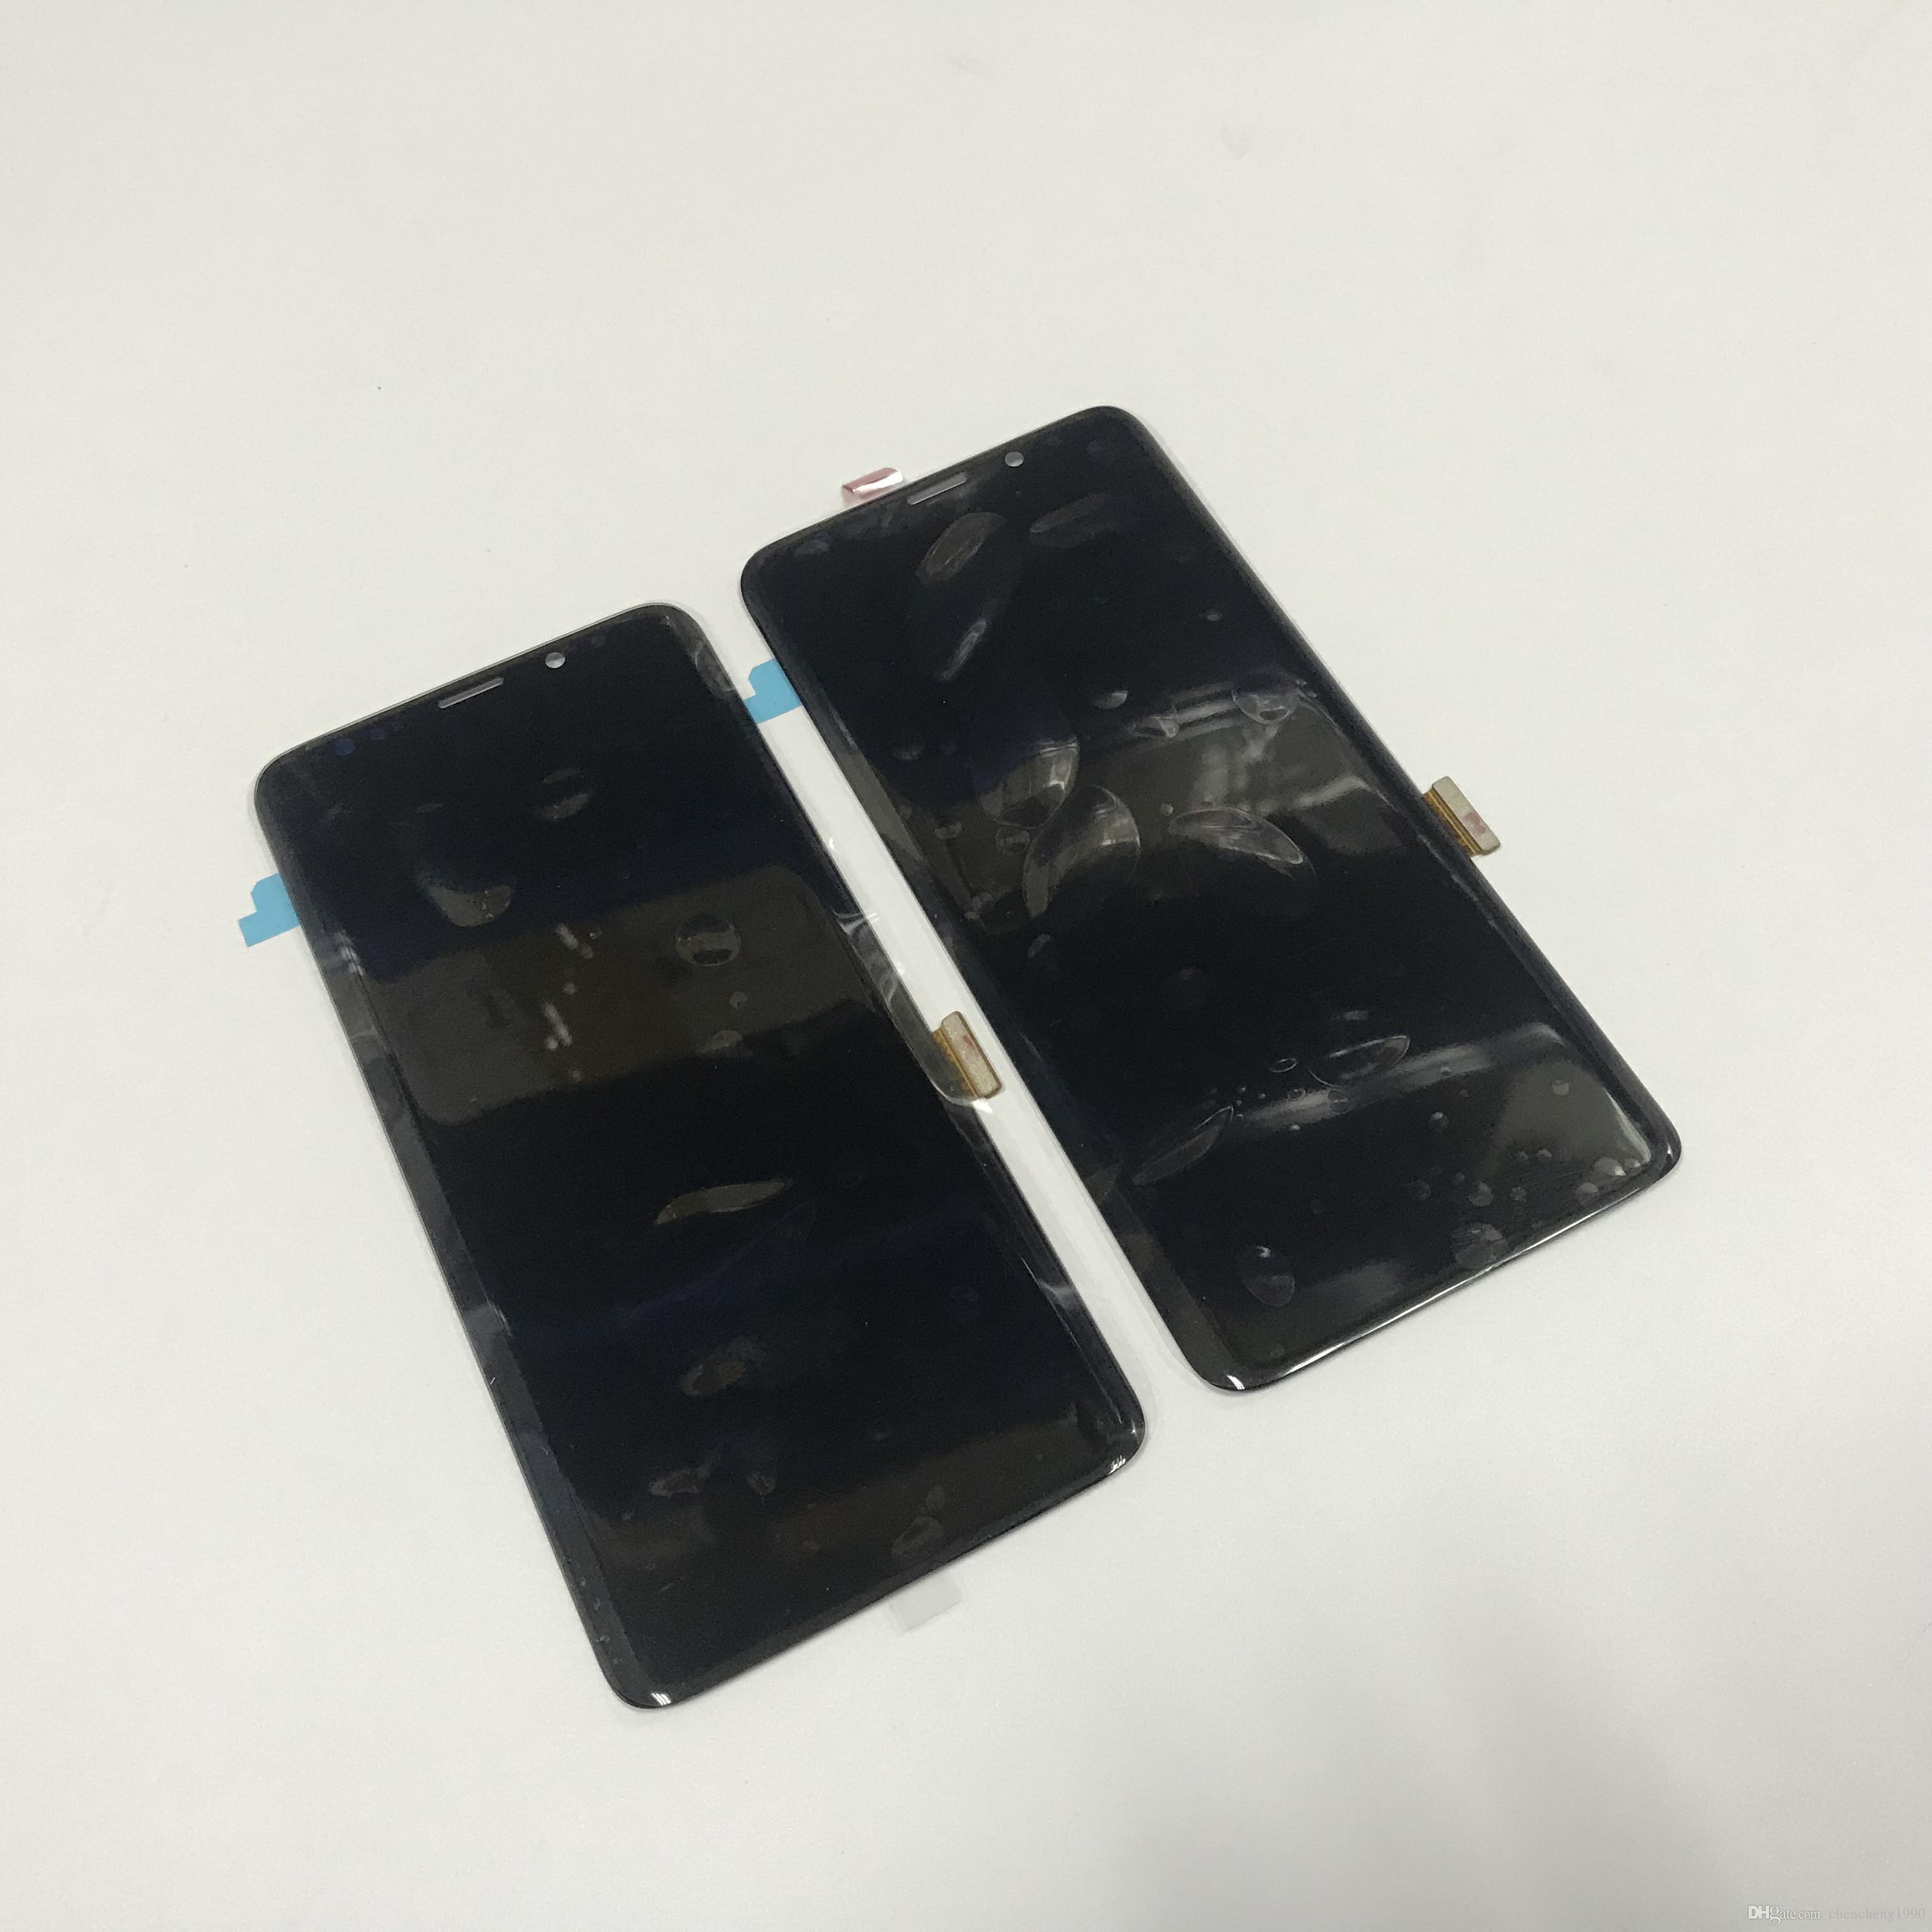 Samsung Galaxy S9 / S9 Artı G960 G965 Orijinal LCD Ekran Dokunmatik Ekran Digitizer Meclisi